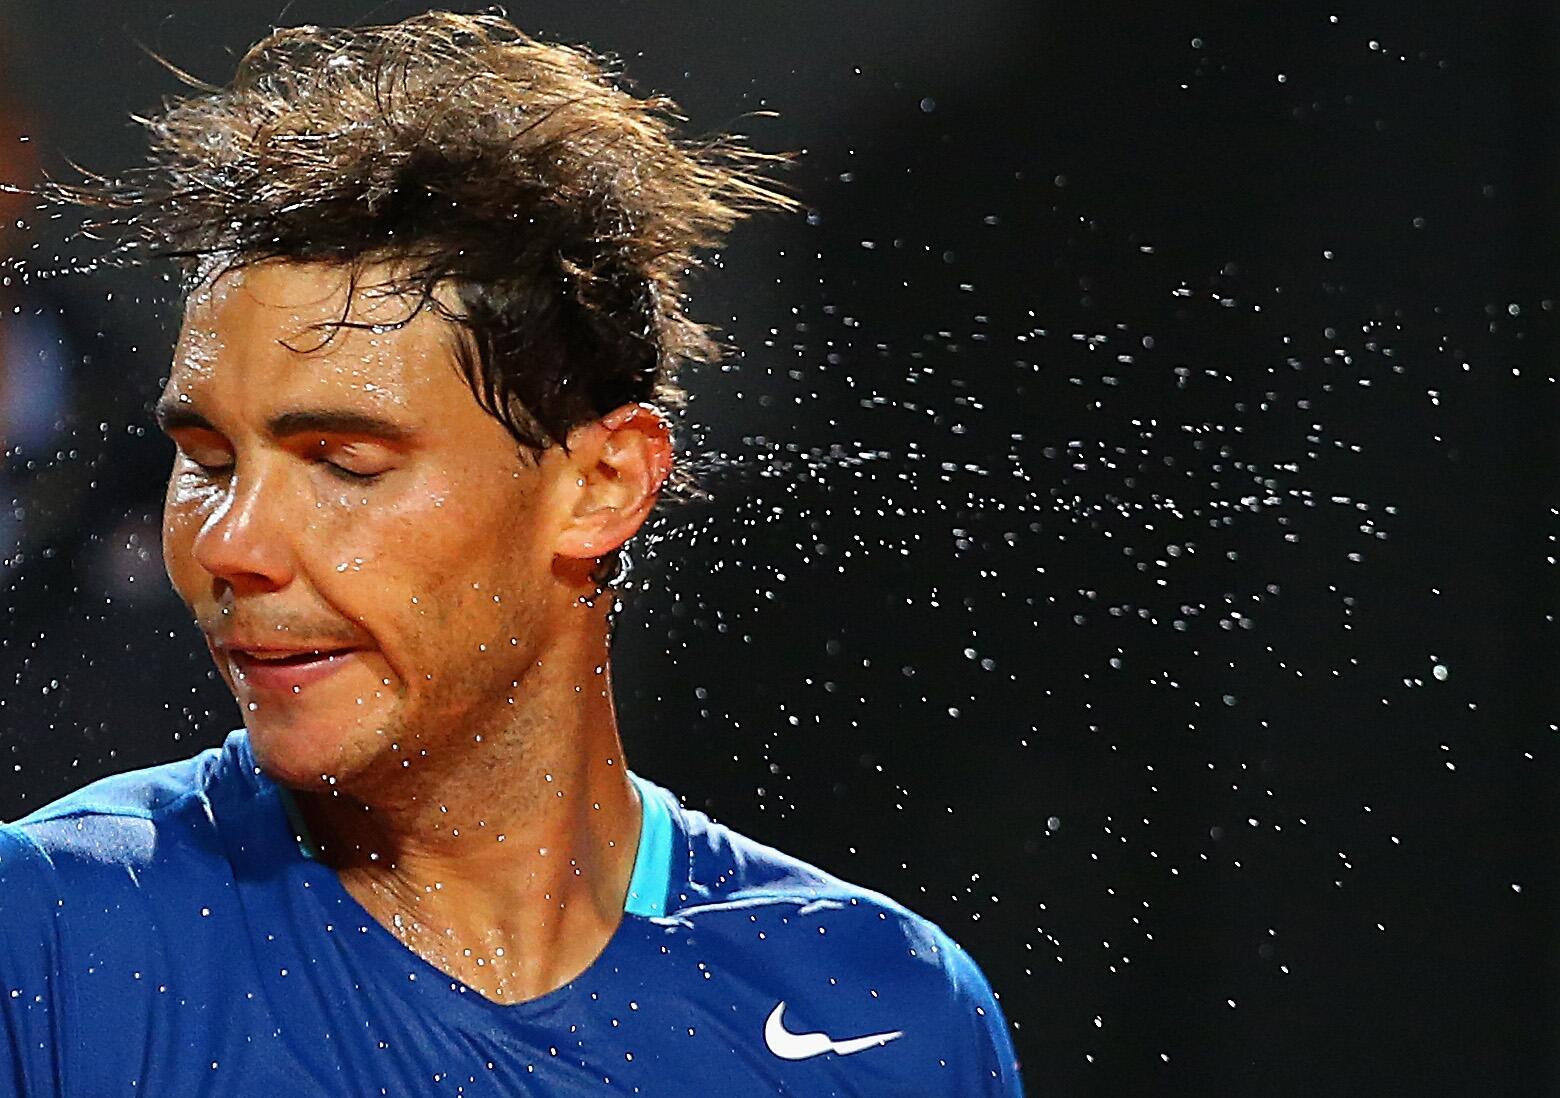 No sweat. RT @christophclarey: One for the Nadal files RT @ByJoeFleming Rafa ... LOL (GETTY) http://t.co/XzXjv5v4BA